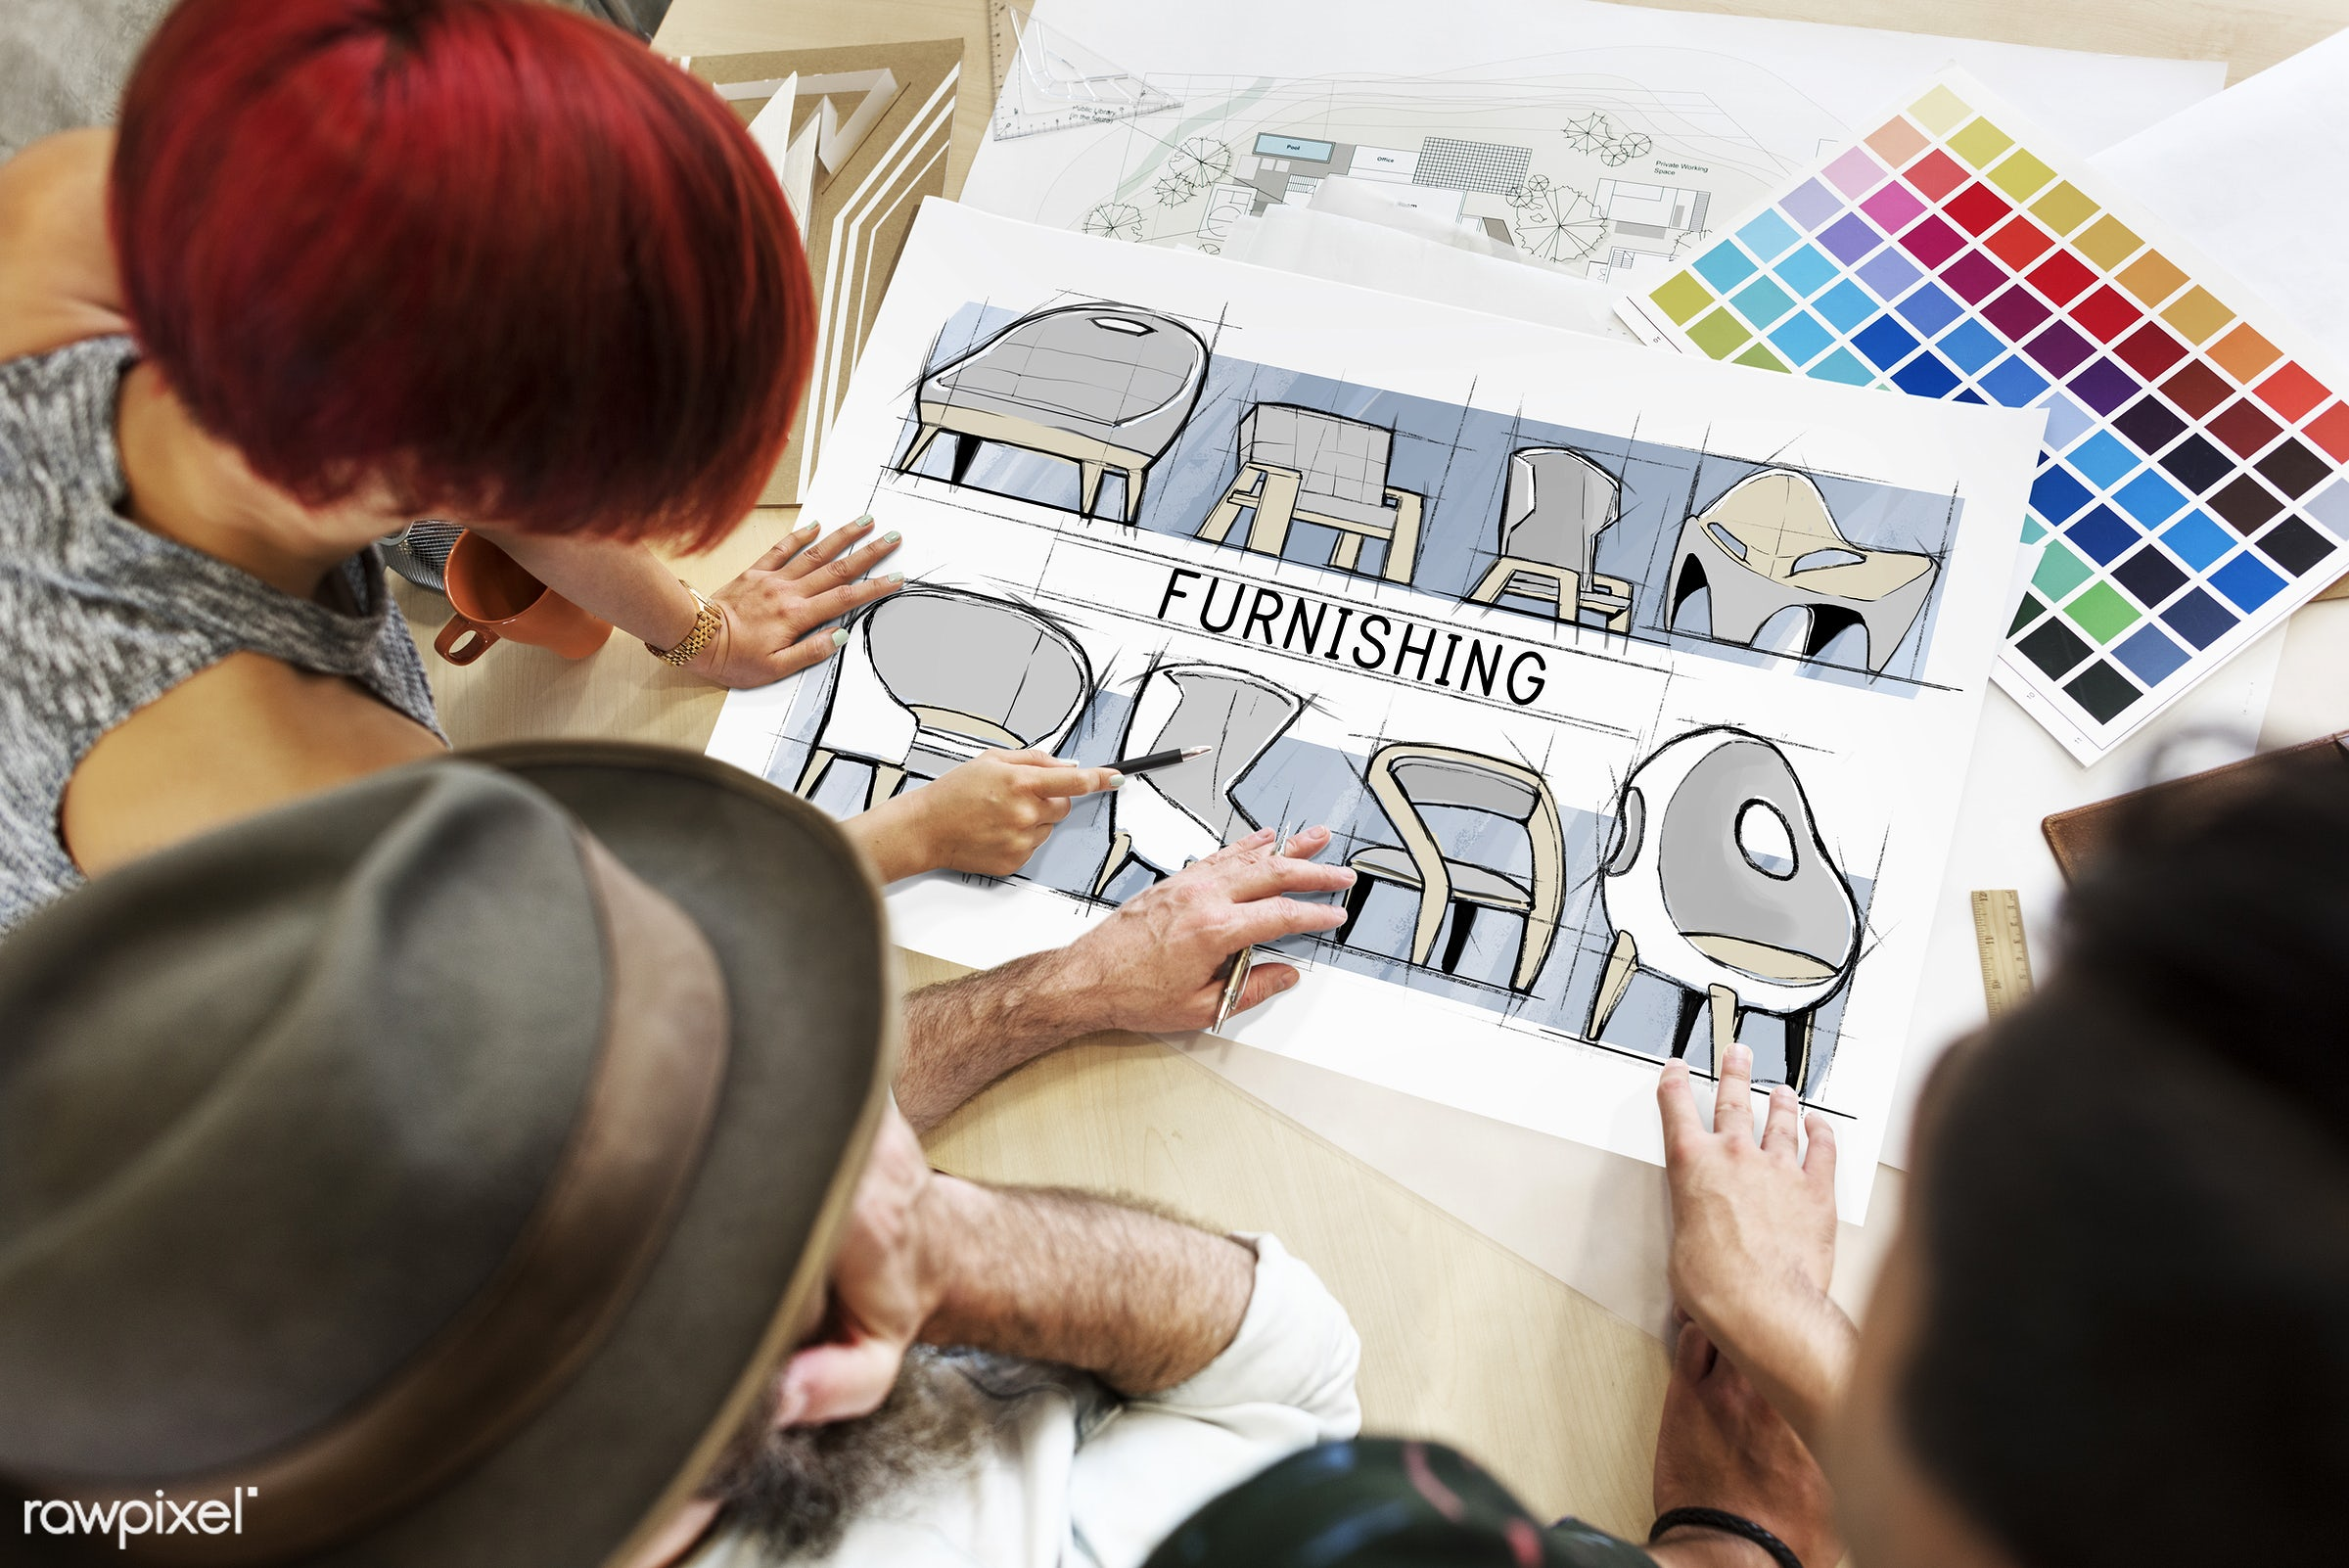 armchair, art, arts, chair, color chart, colors, craft, craftsman, craftsmanship, creativity, decoration, design, discussion...